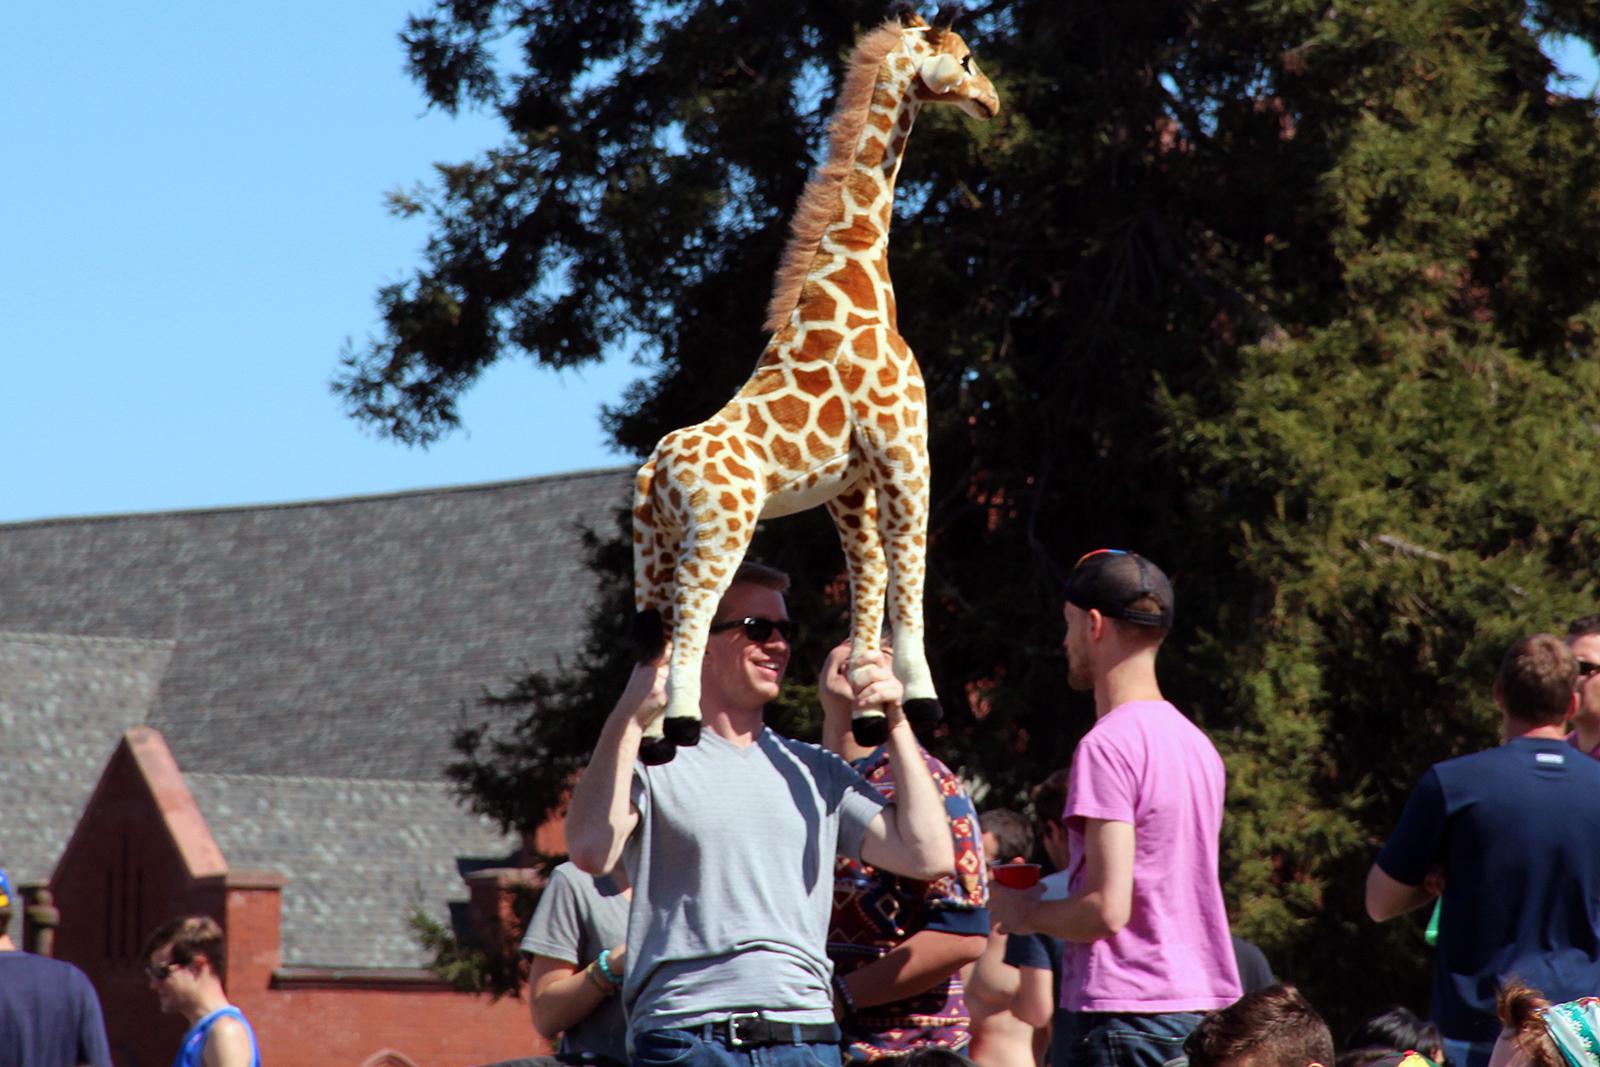 SNAP: Giraffe Sighting